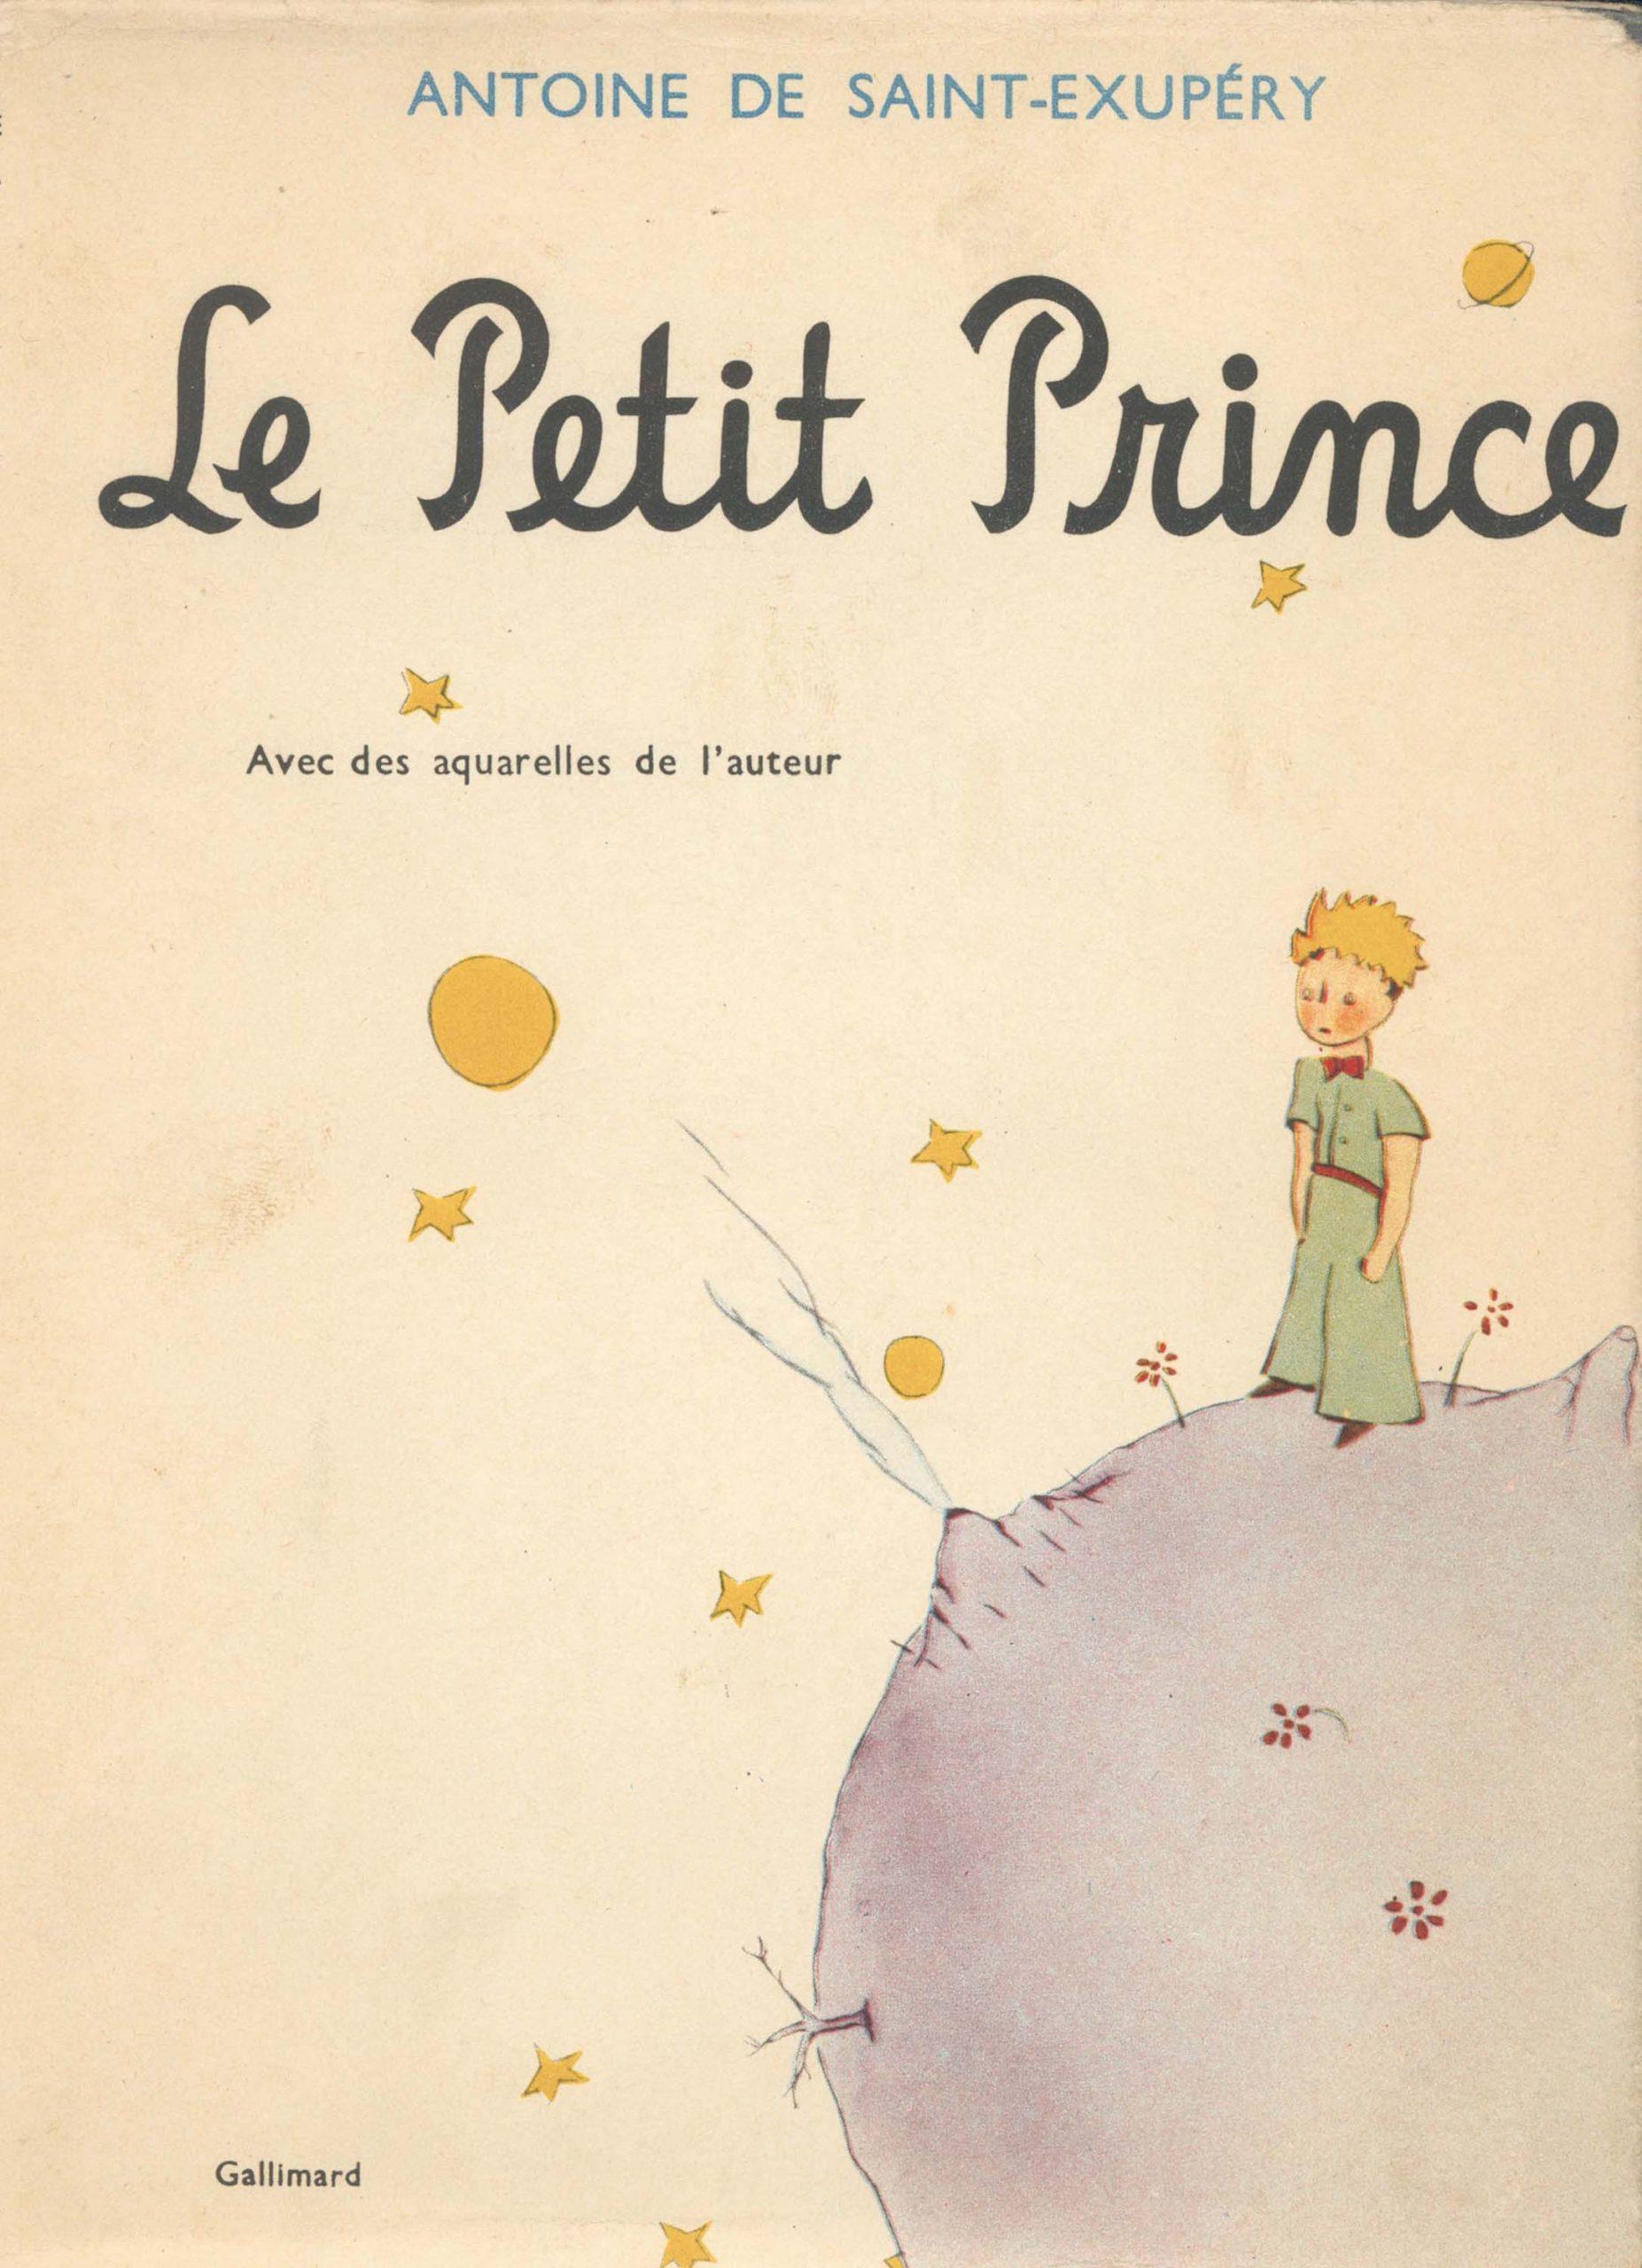 Le Petit Prince_1943_Original_Cover